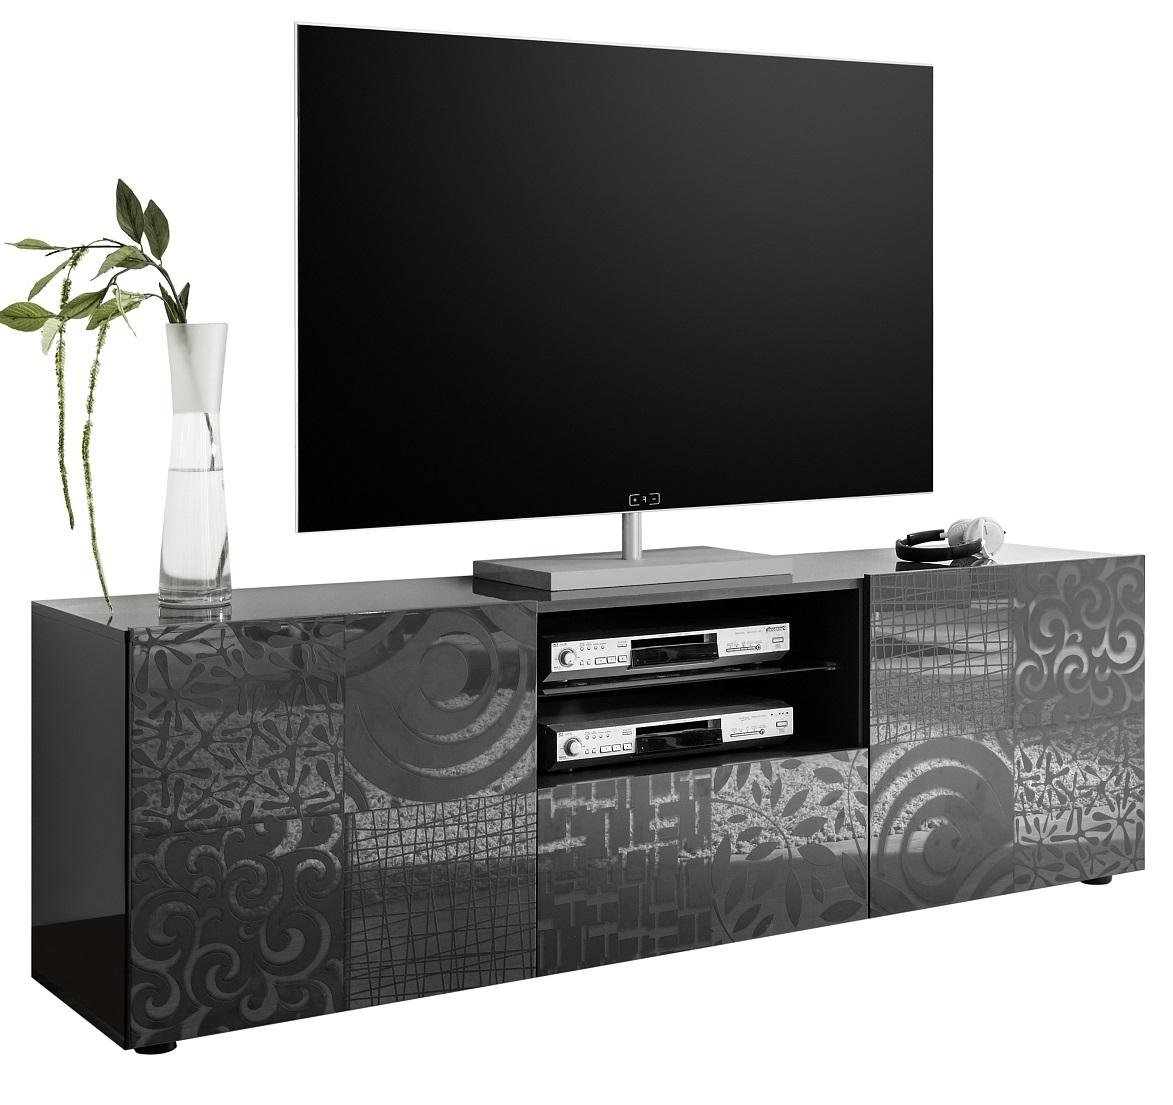 Tv-meubel Miro 181 cm breed in hoogglans antraciet   Pesaro Mobilia